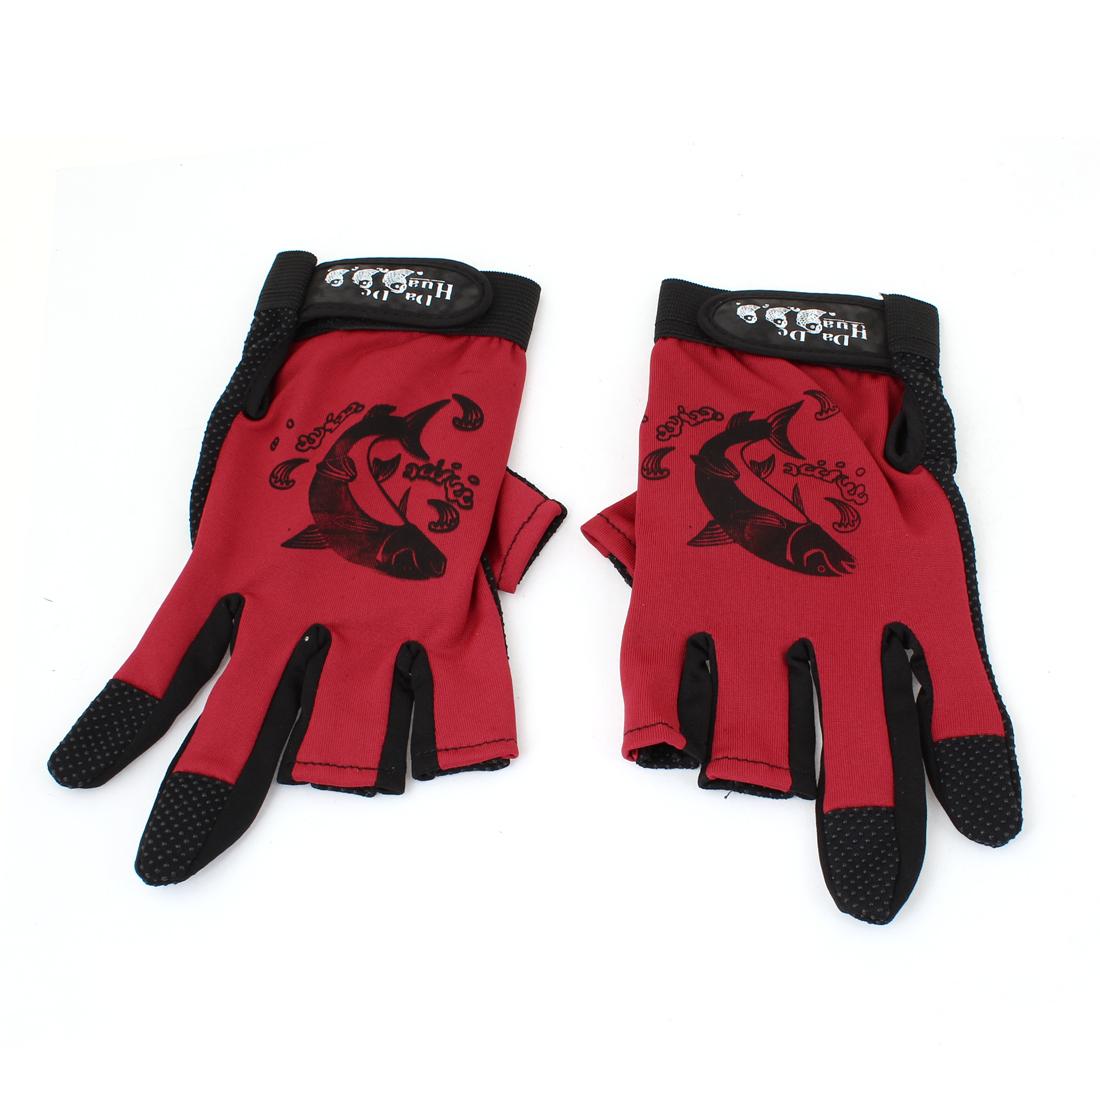 Red Black Detachable Closure Nonslip Fishing Sports 3 Fingerless Glove x 2